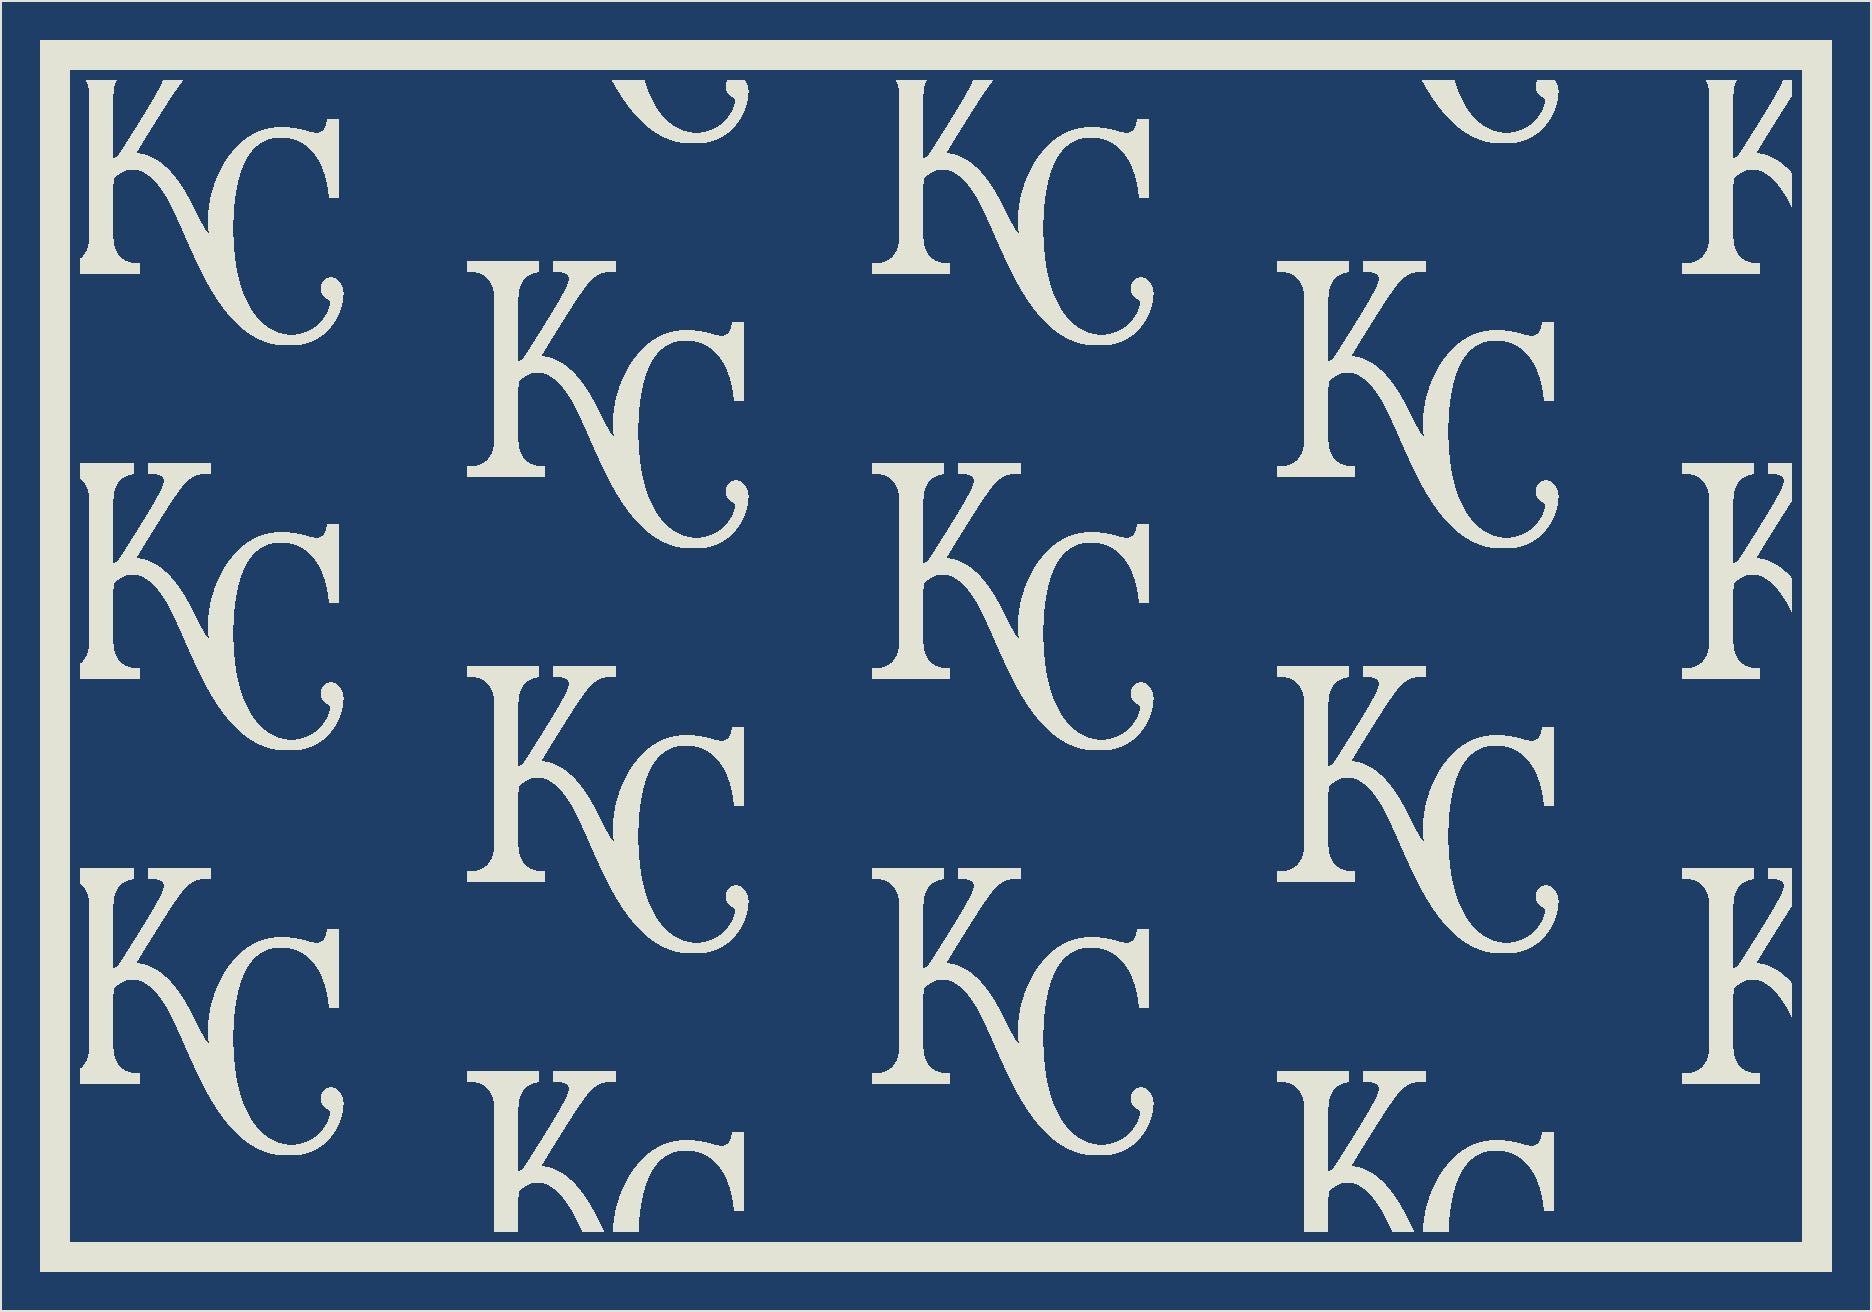 Kansas City Royals Logo Wallpaper Download HD Wallpapers 1872x1312